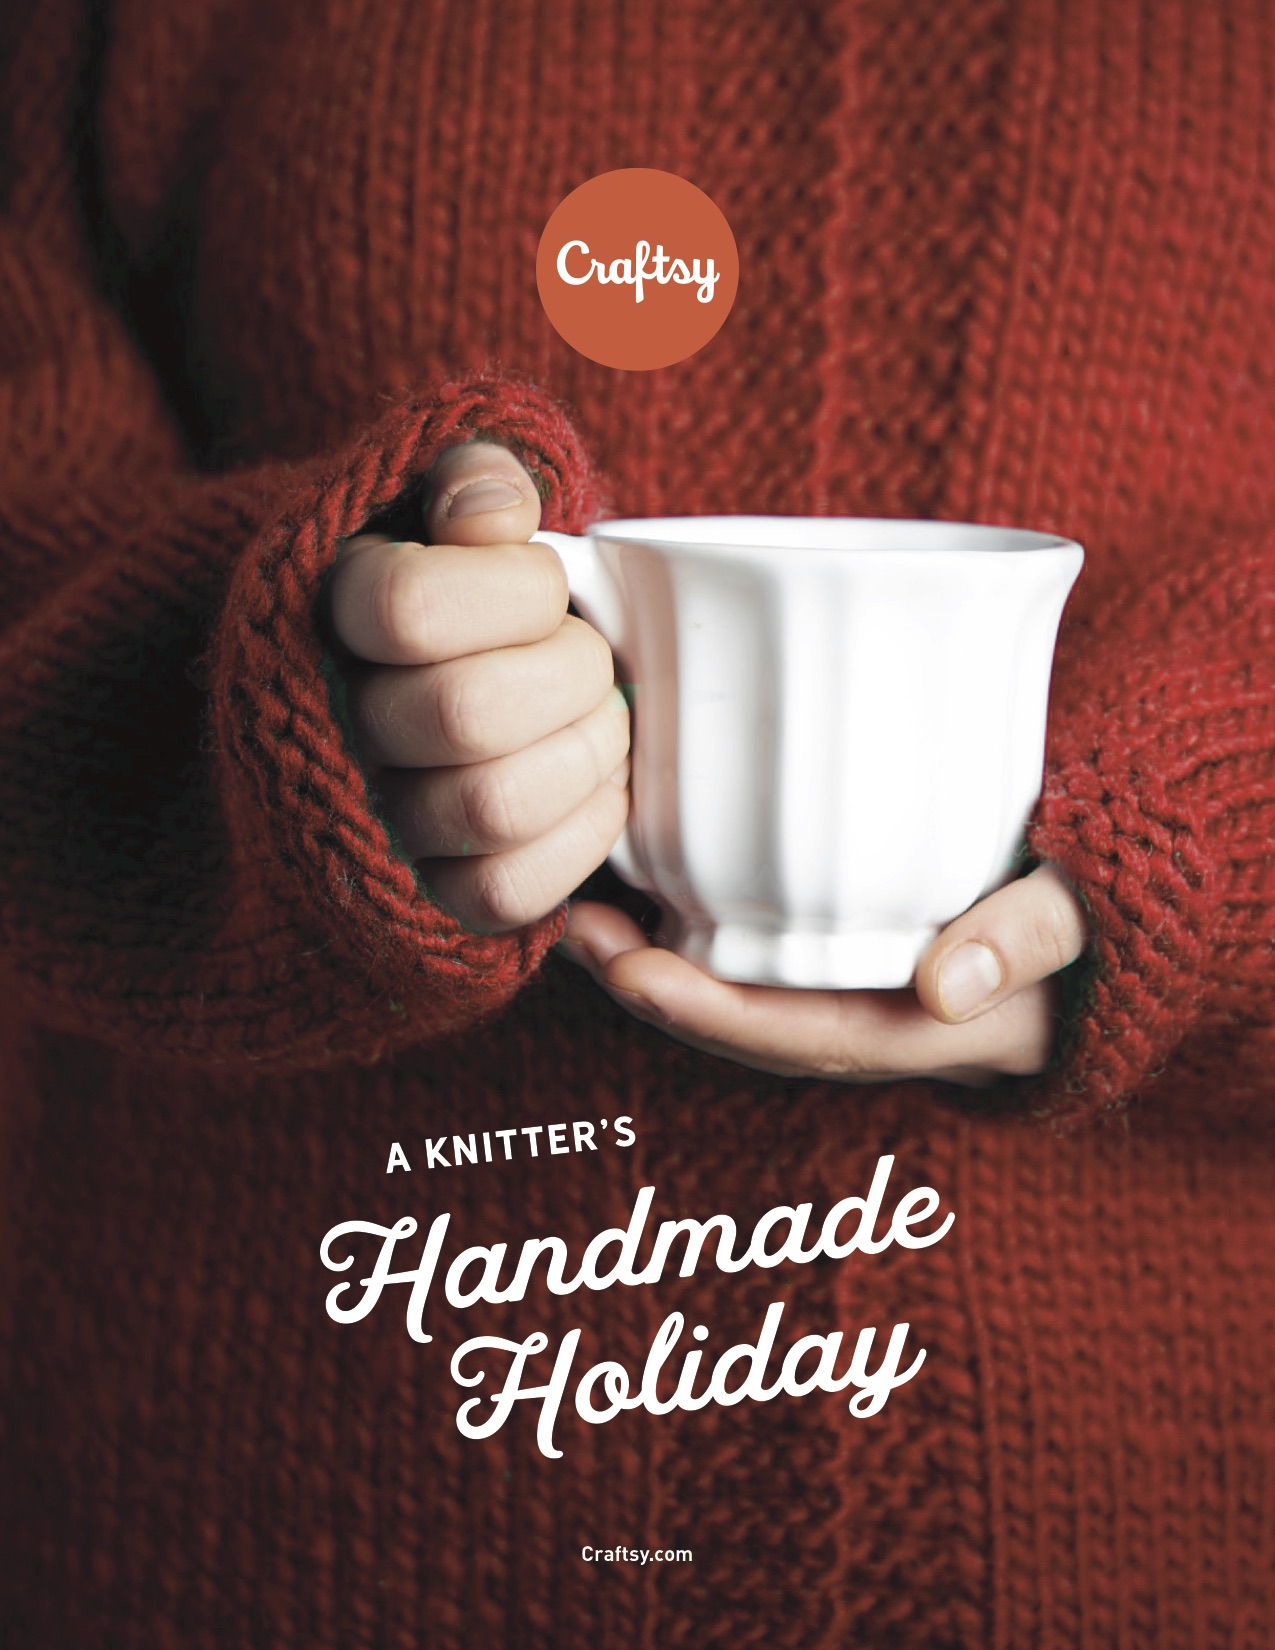 Bluprint's A Knitter's Handmade Holiday 2016 Catalog